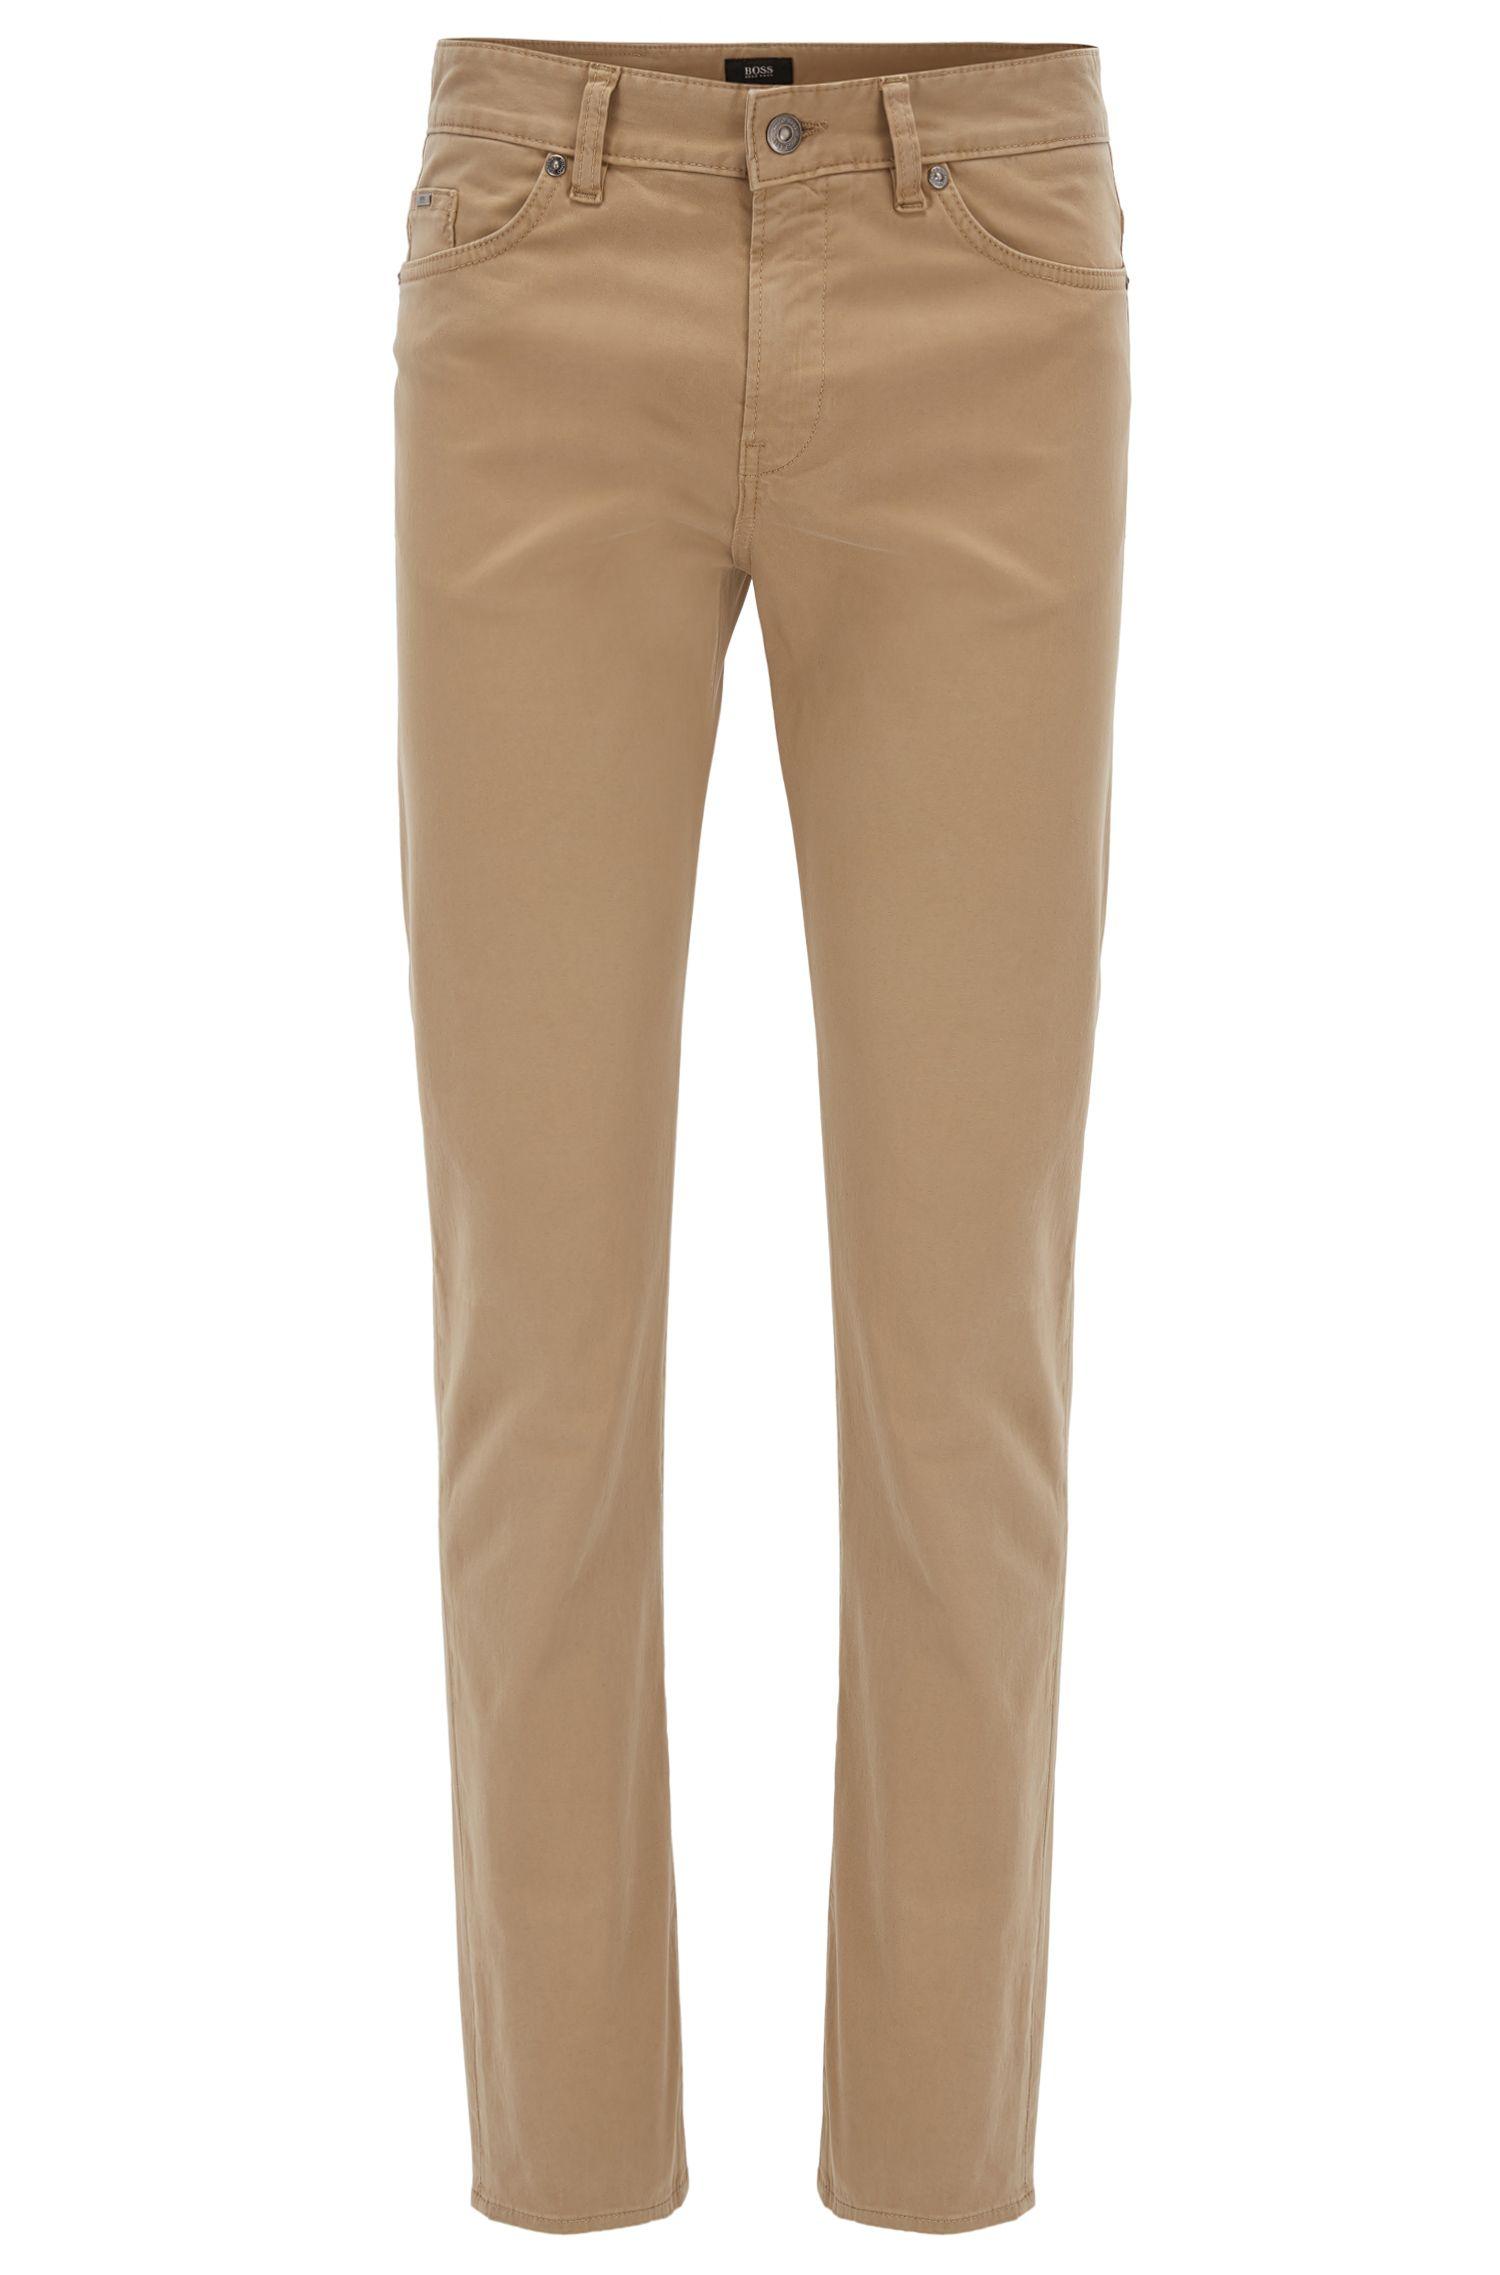 Slim-Fit Jeans aus gebürstetem Stretch-Denim mit Satin-Finish